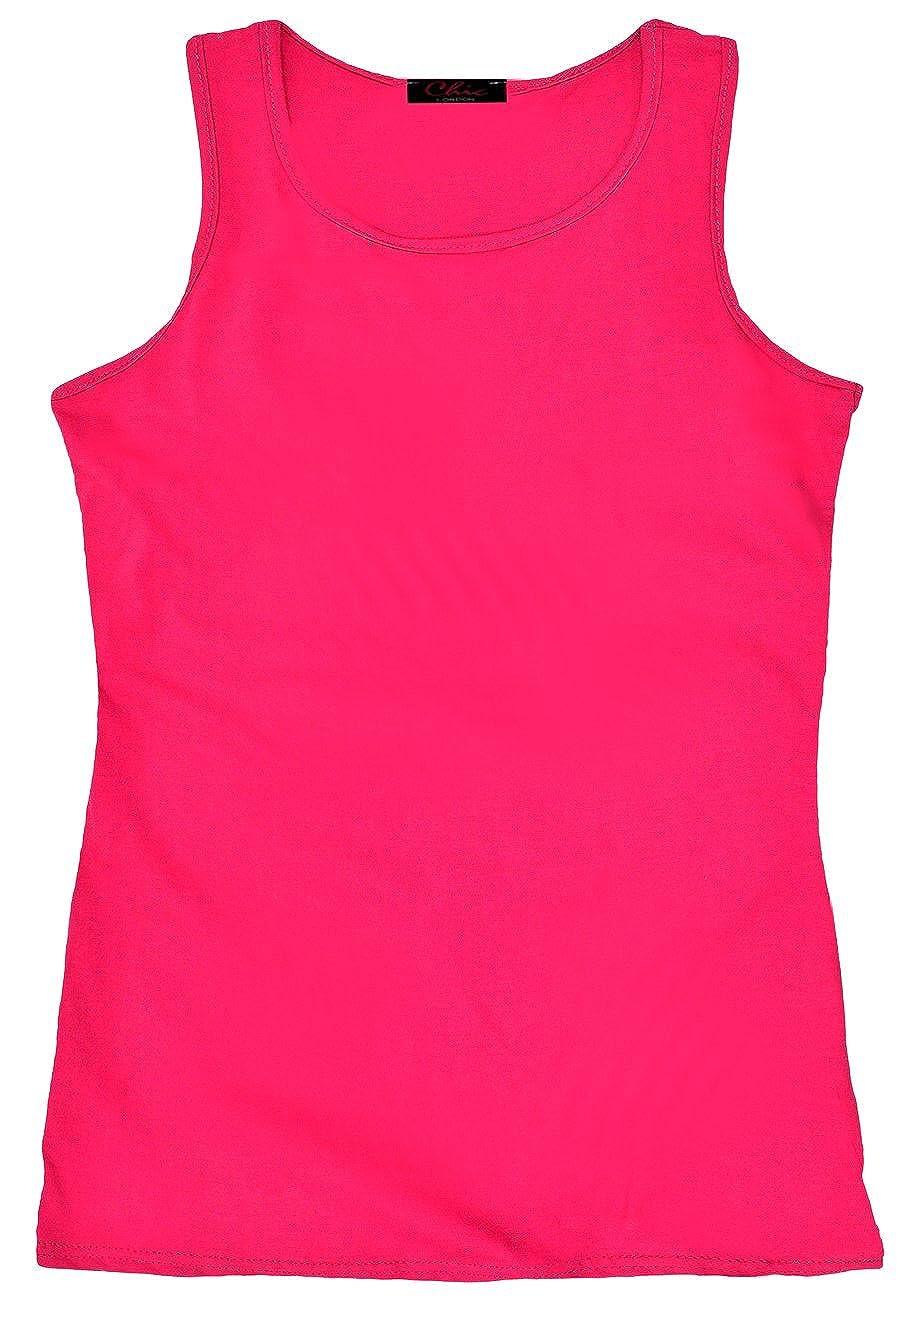 AEL Girls Racer Back Plain Summer Sleeveless Vest Top Kids T-Shirt New 7-13 Years